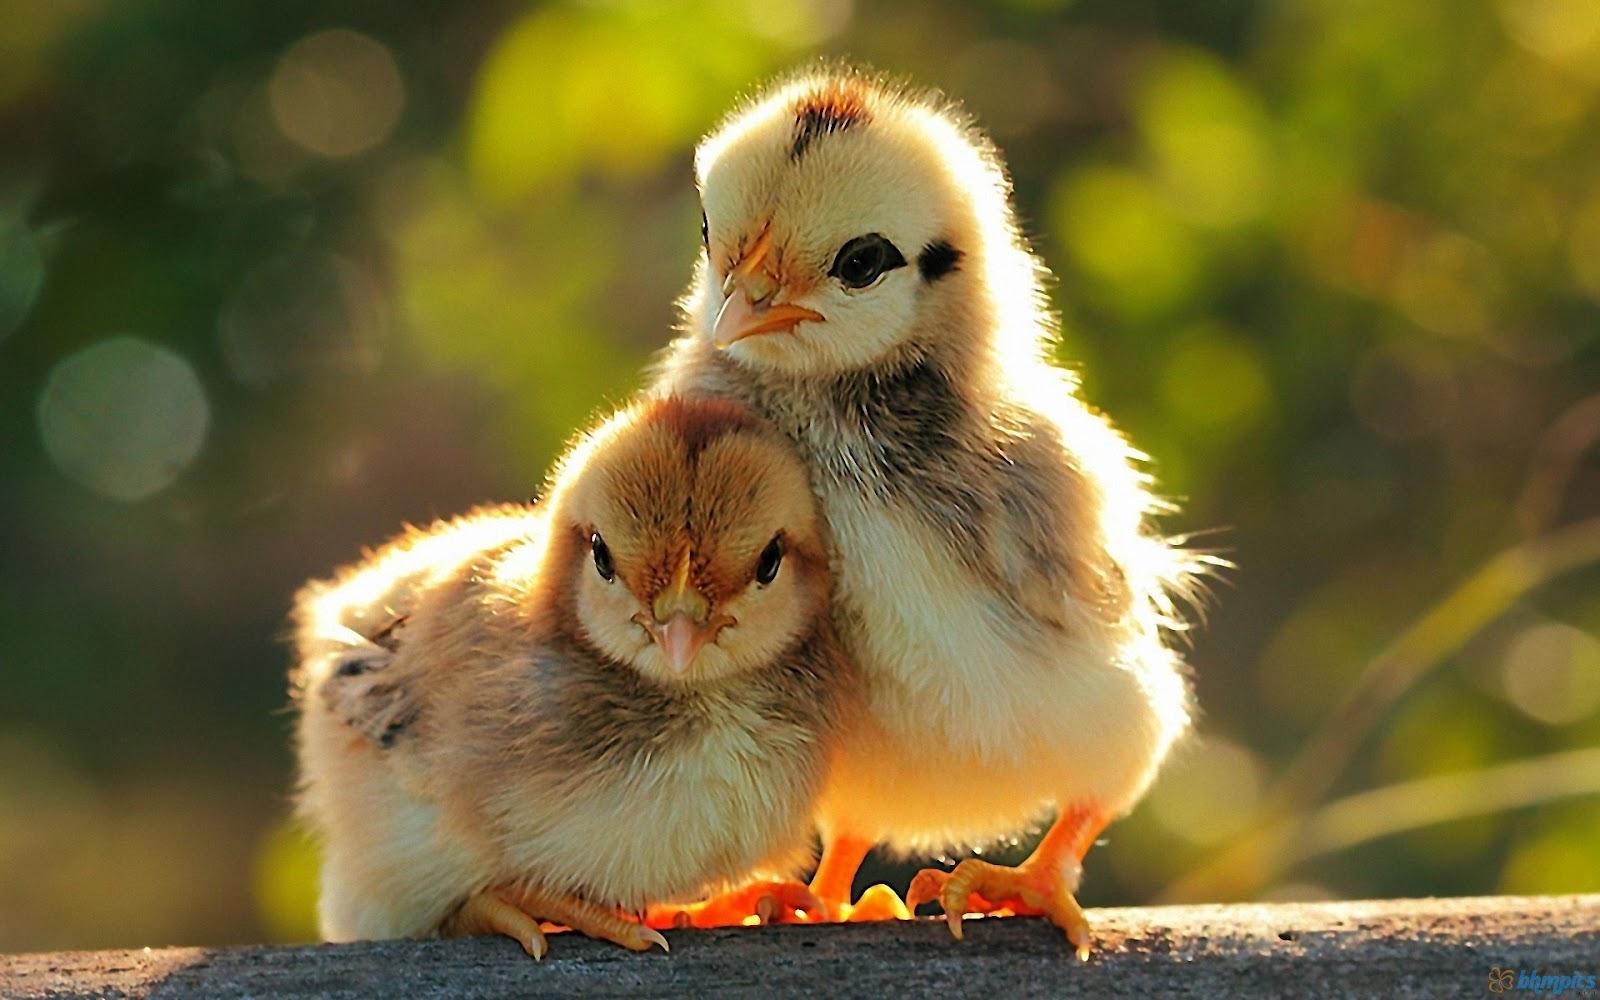 http://3.bp.blogspot.com/-PPwsS2nh9m0/UCfvyTC4JkI/AAAAAAAACnI/0-JJdF1Ziv4/s1600/two_chickens_baby-1920x1200.jpg